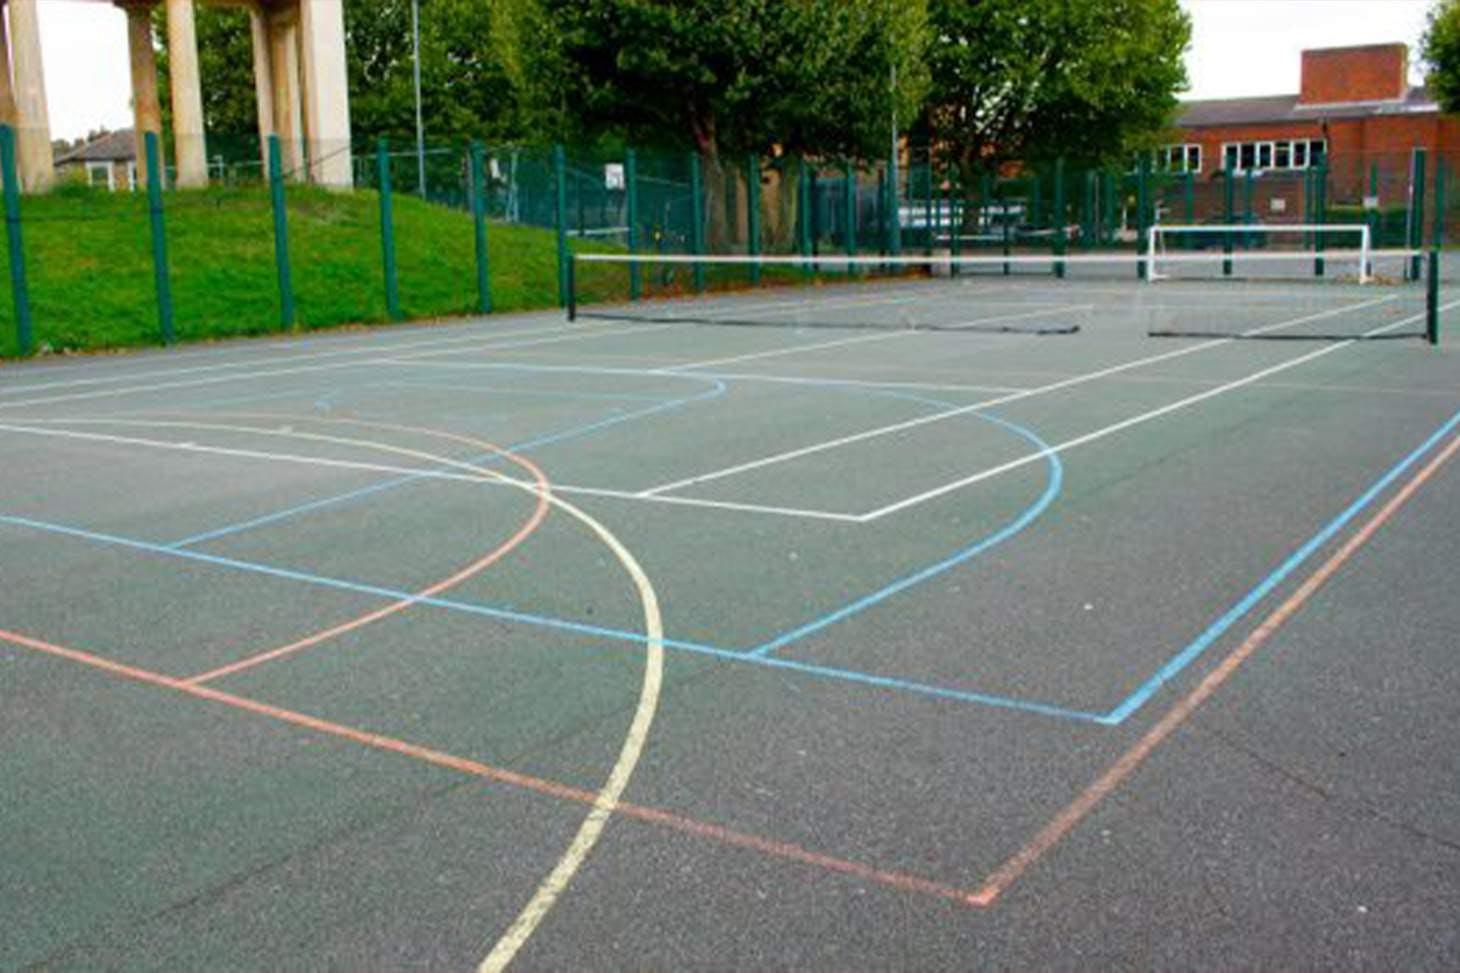 Clapton Girls' School Court   Hard (macadam) basketball court